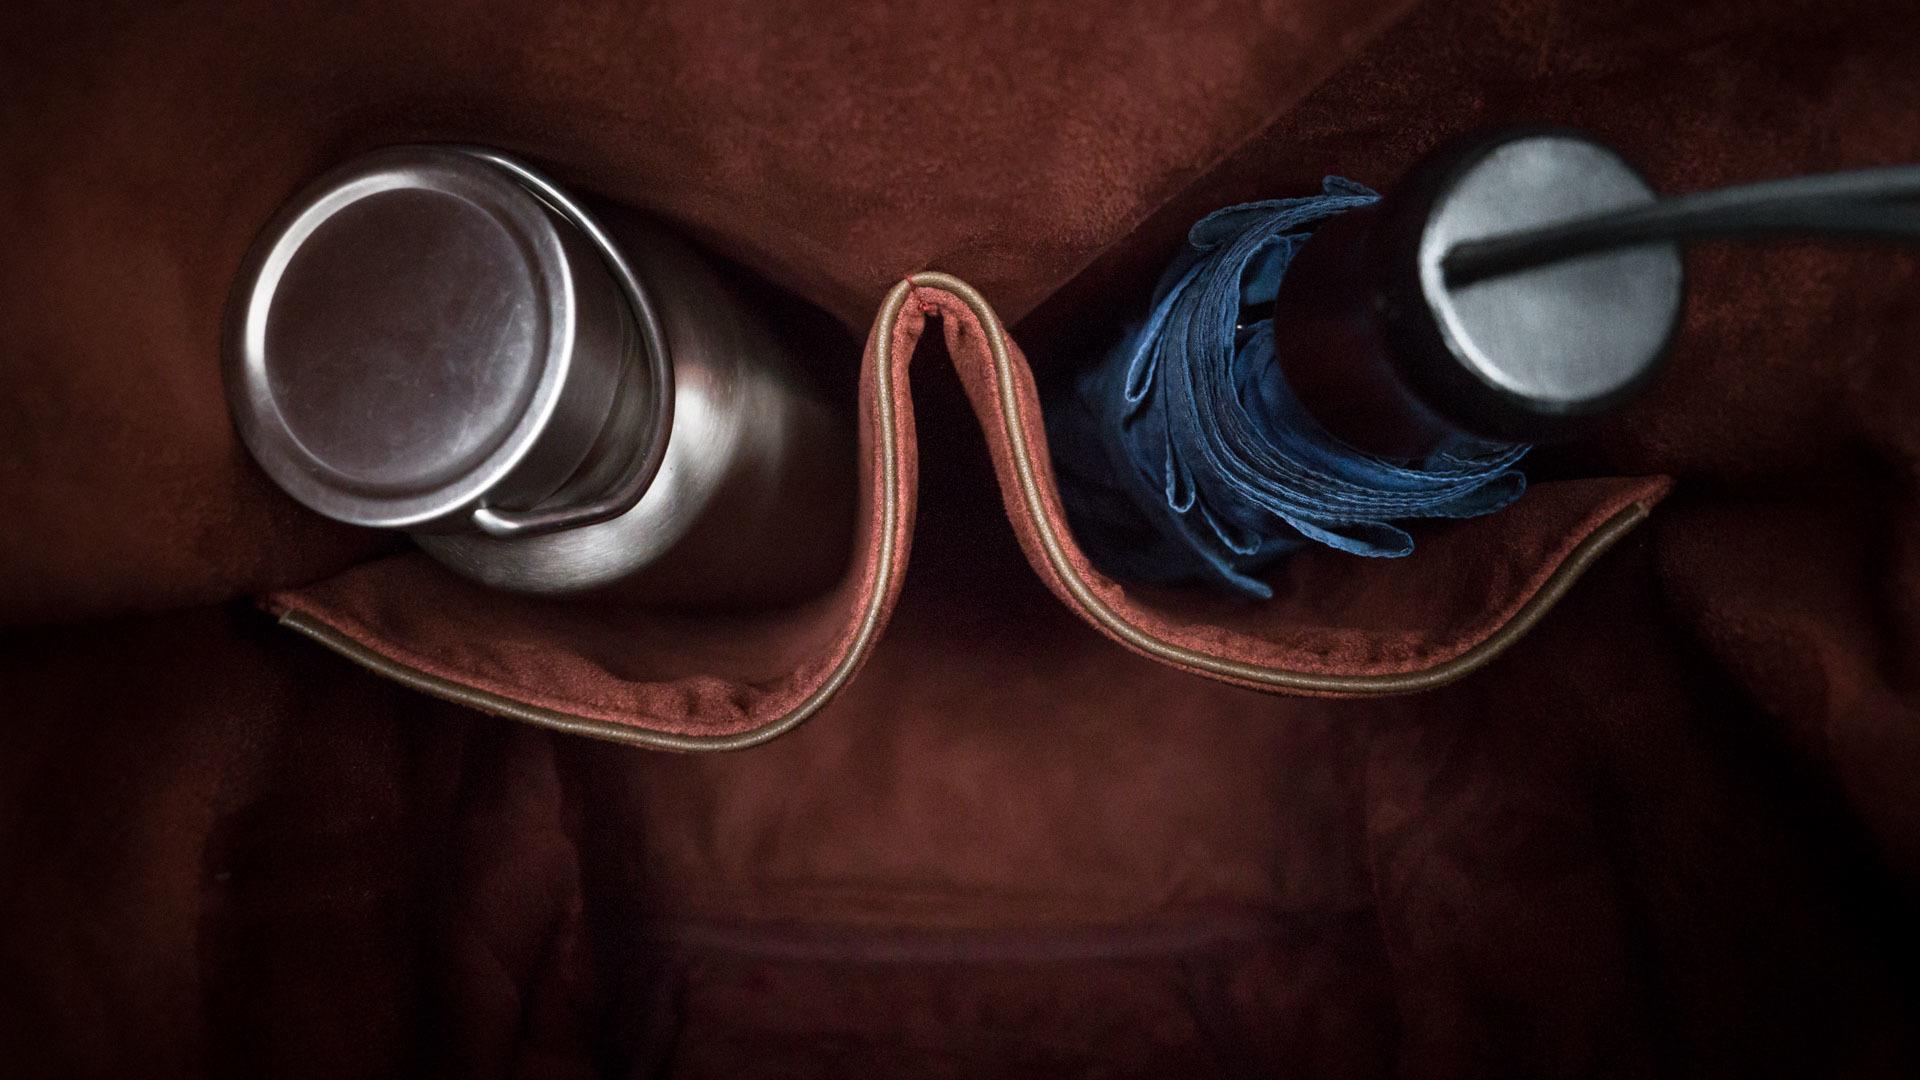 Interior dual deep pockets.